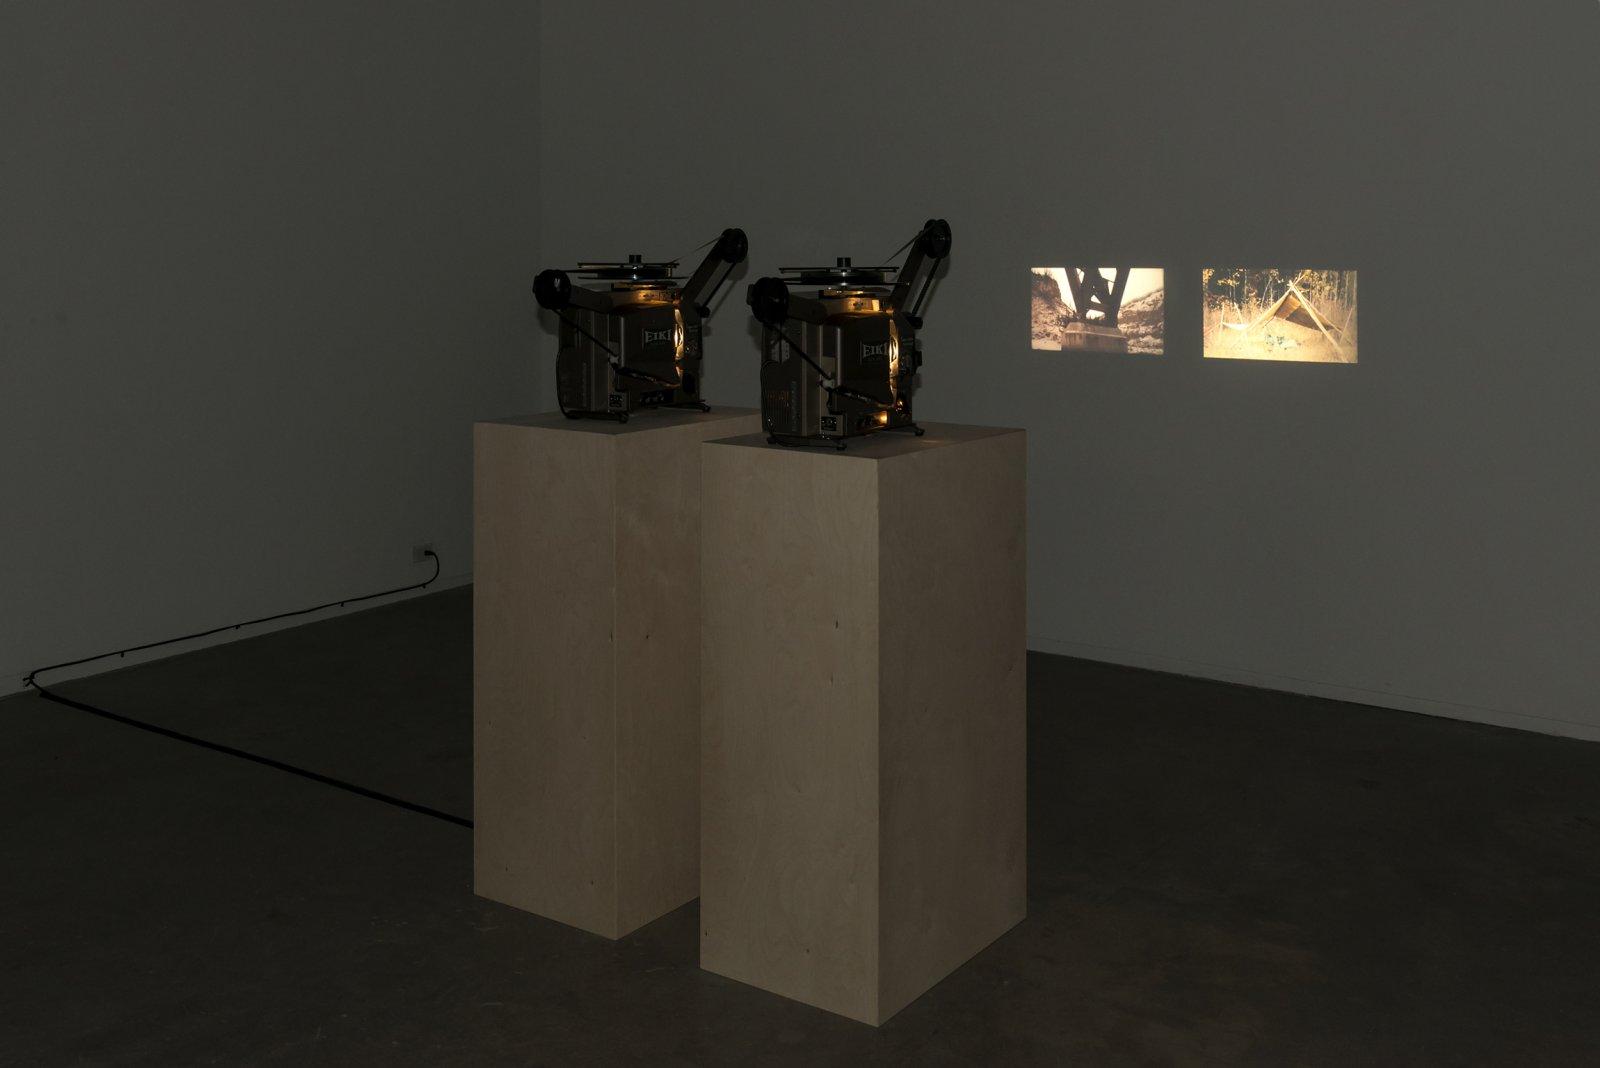 Brian Jungen and Duane Linklater, Lean, 2012, super 16mm film loop on projector, 10 minutes